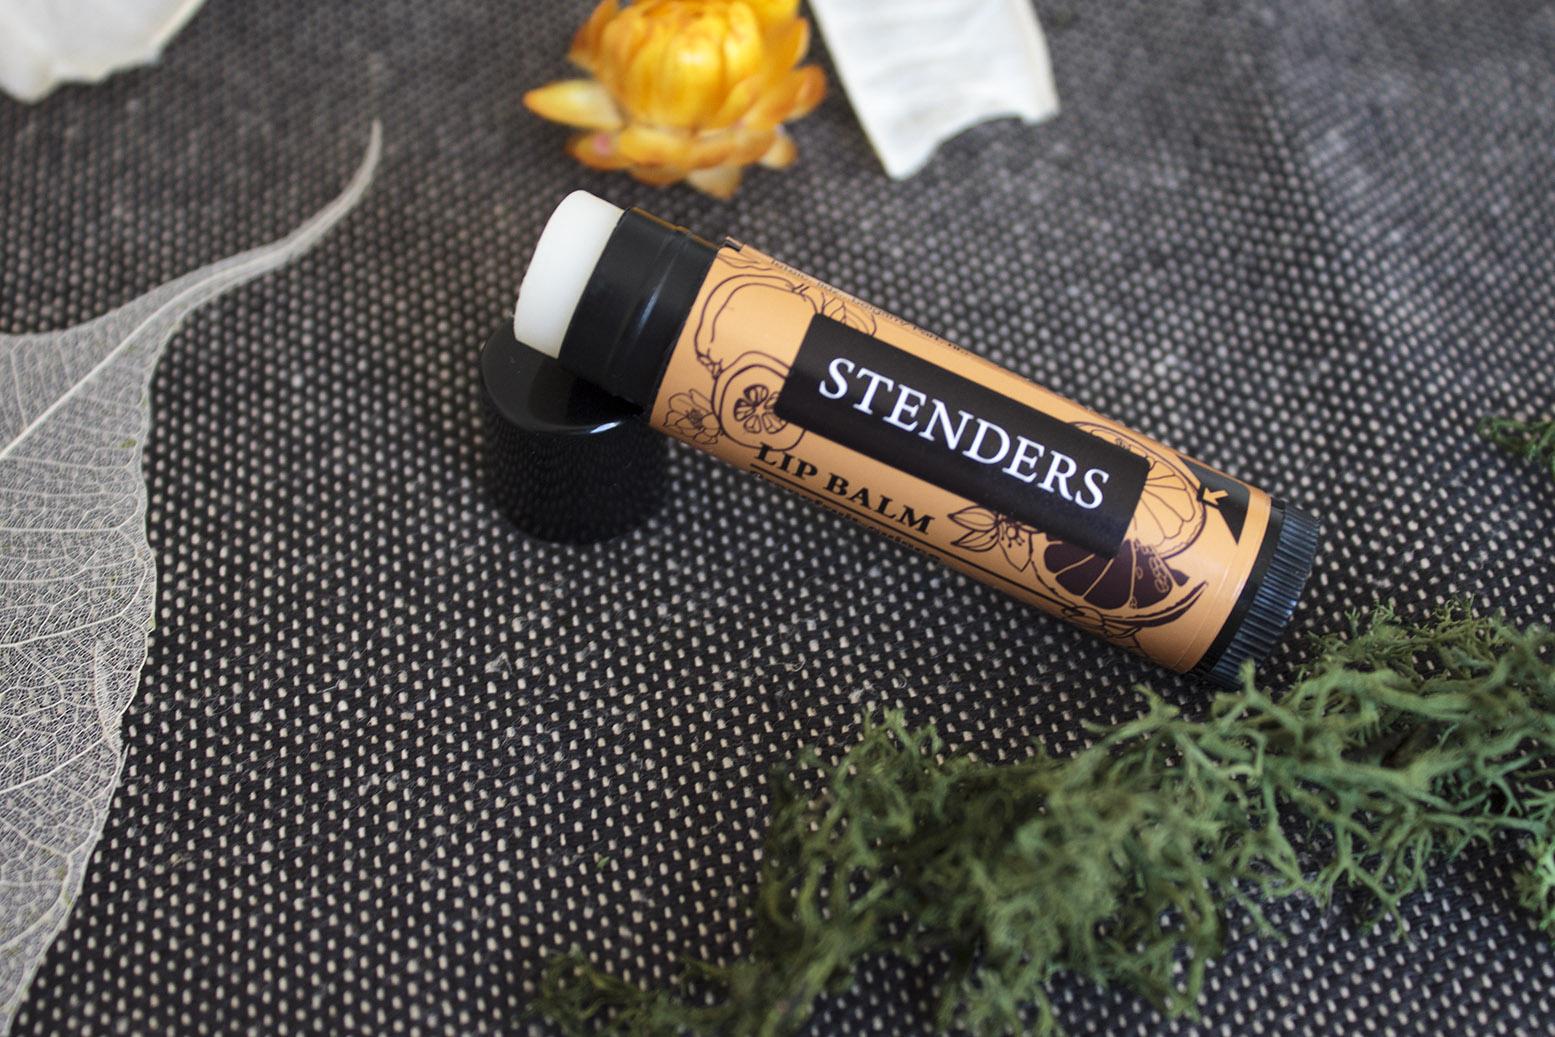 Stenders lip balm